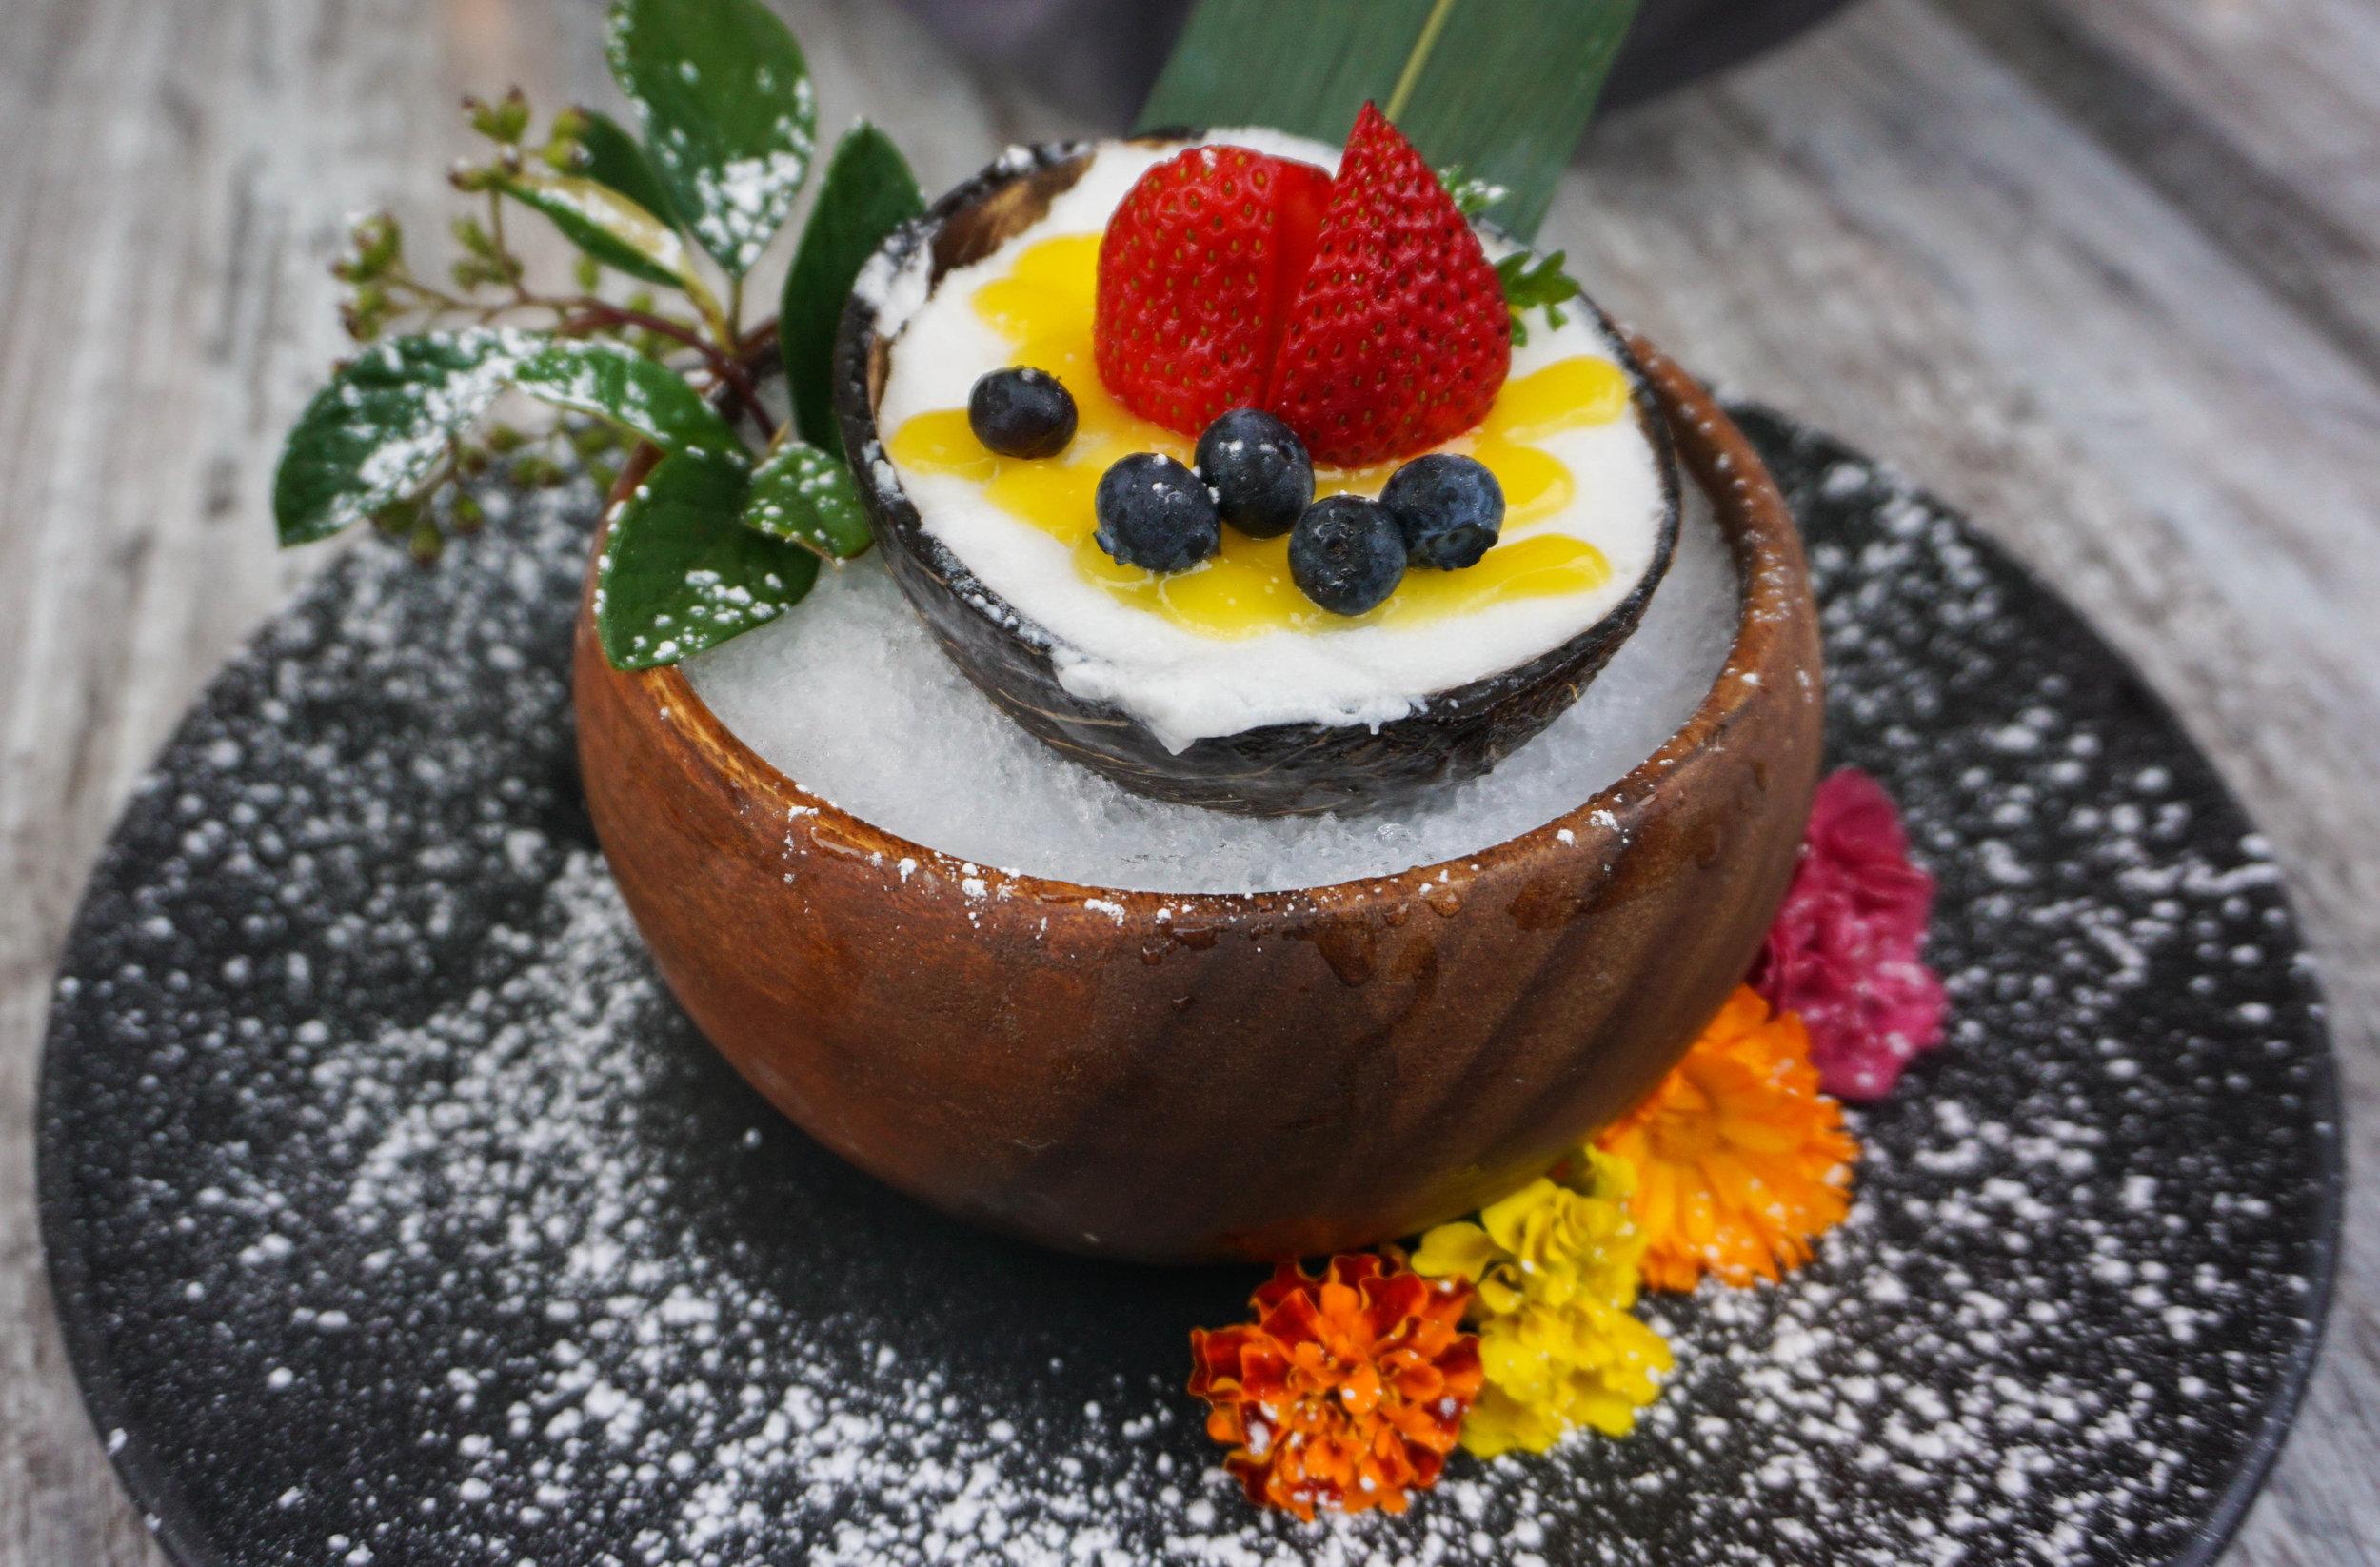 Some kind of coconut ice cream